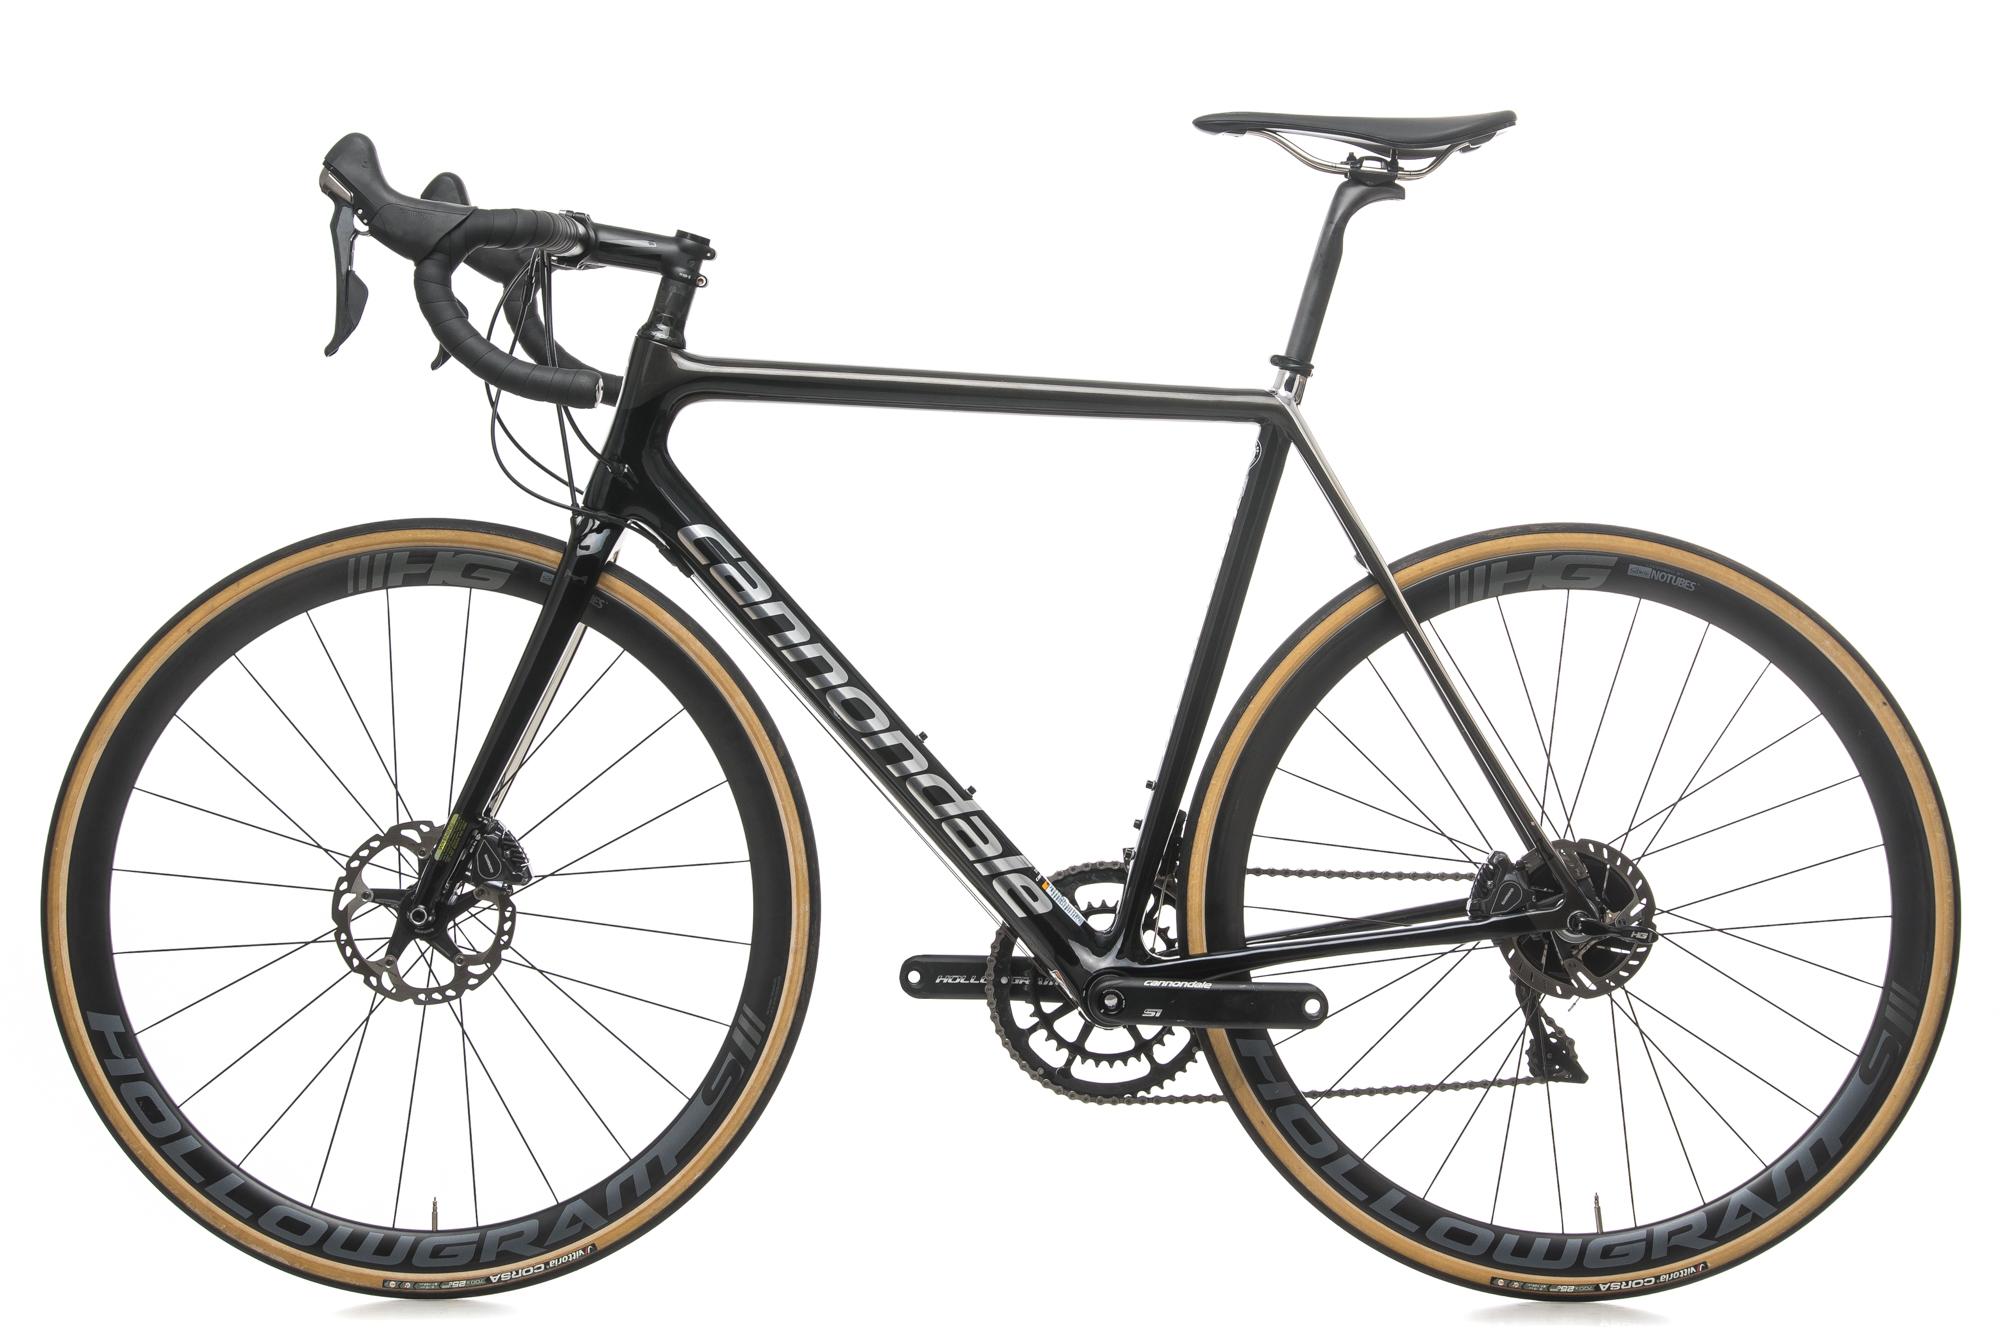 bdd2efdb5a7 2018 Cannondale SuperSix EVO Hi-Mod Disc Road Bike 56cm Large Carbon Dura- Ace